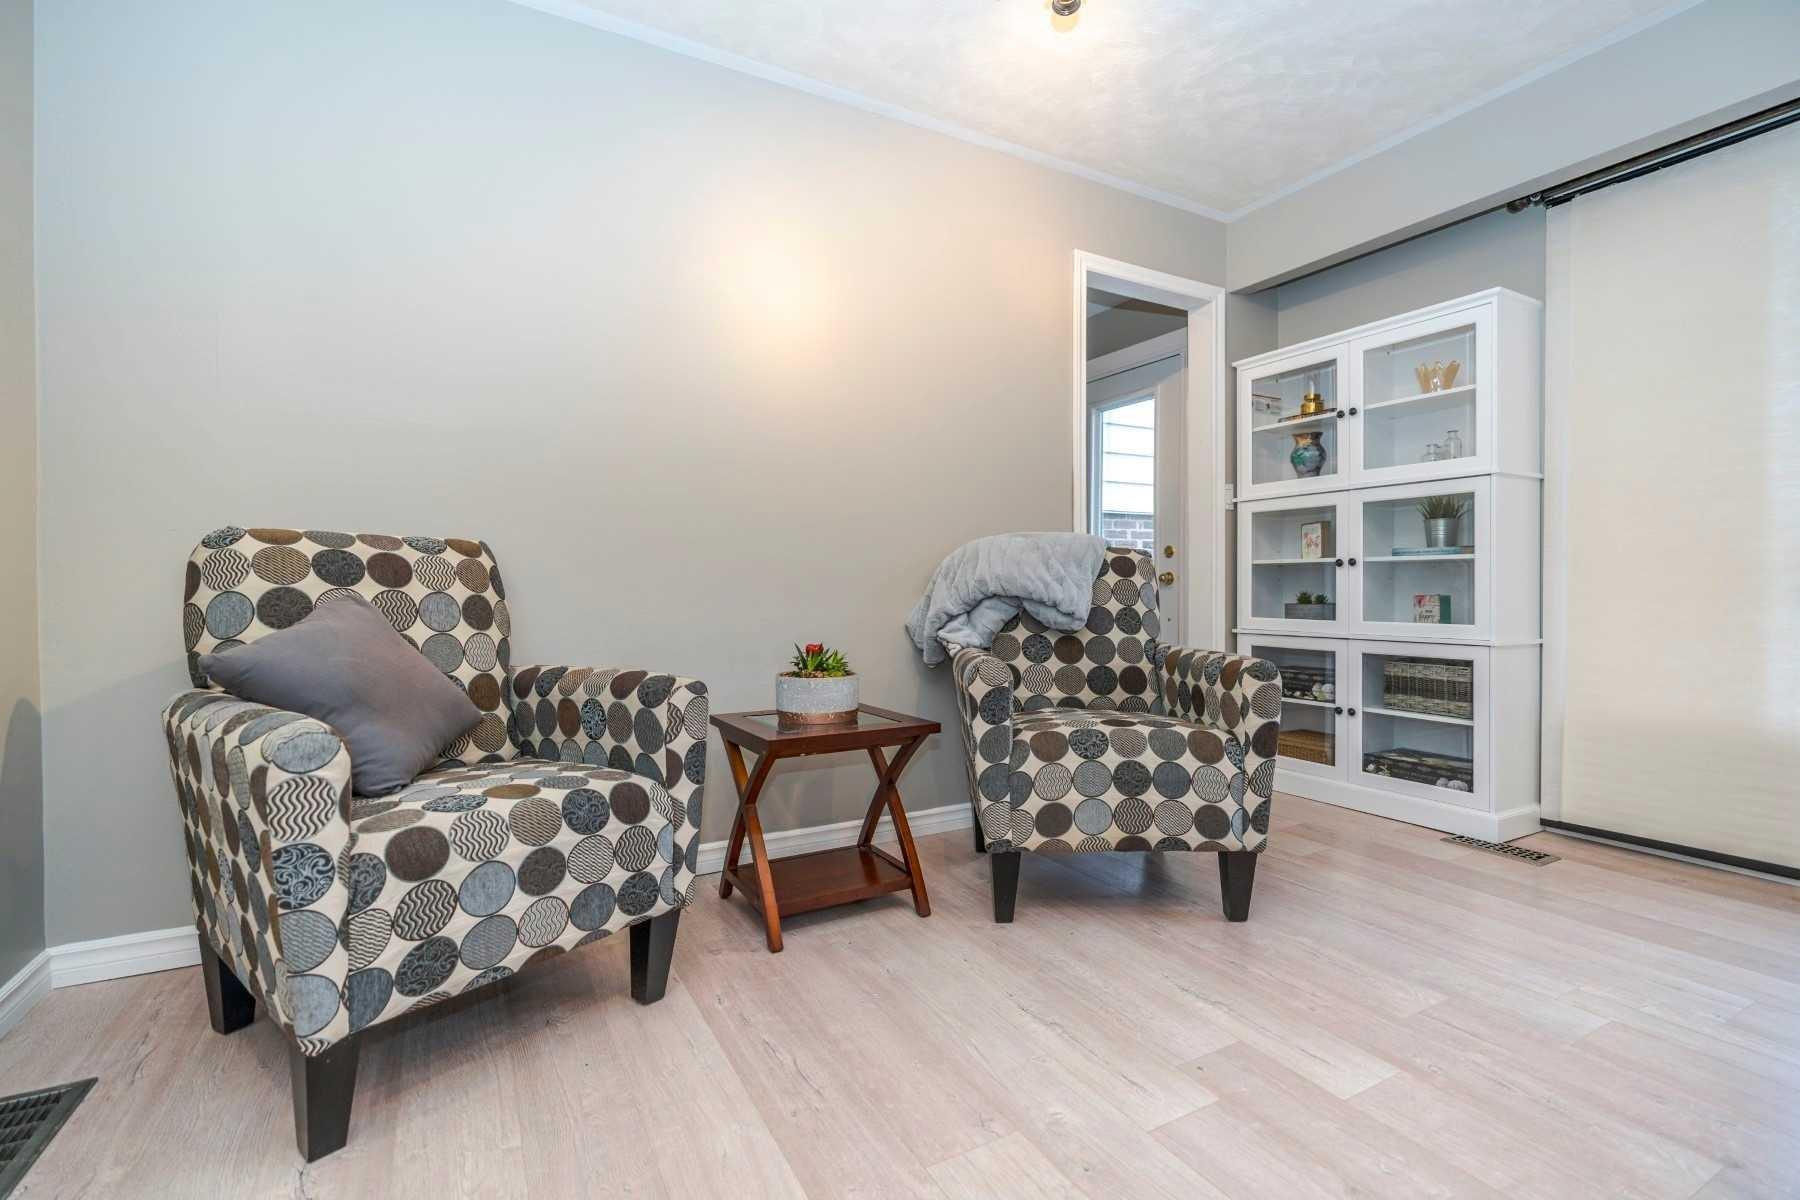 Photo 4: Photos: 190 N Church Street in Clarington: Orono House (Sidesplit 4) for sale : MLS®# E4463047